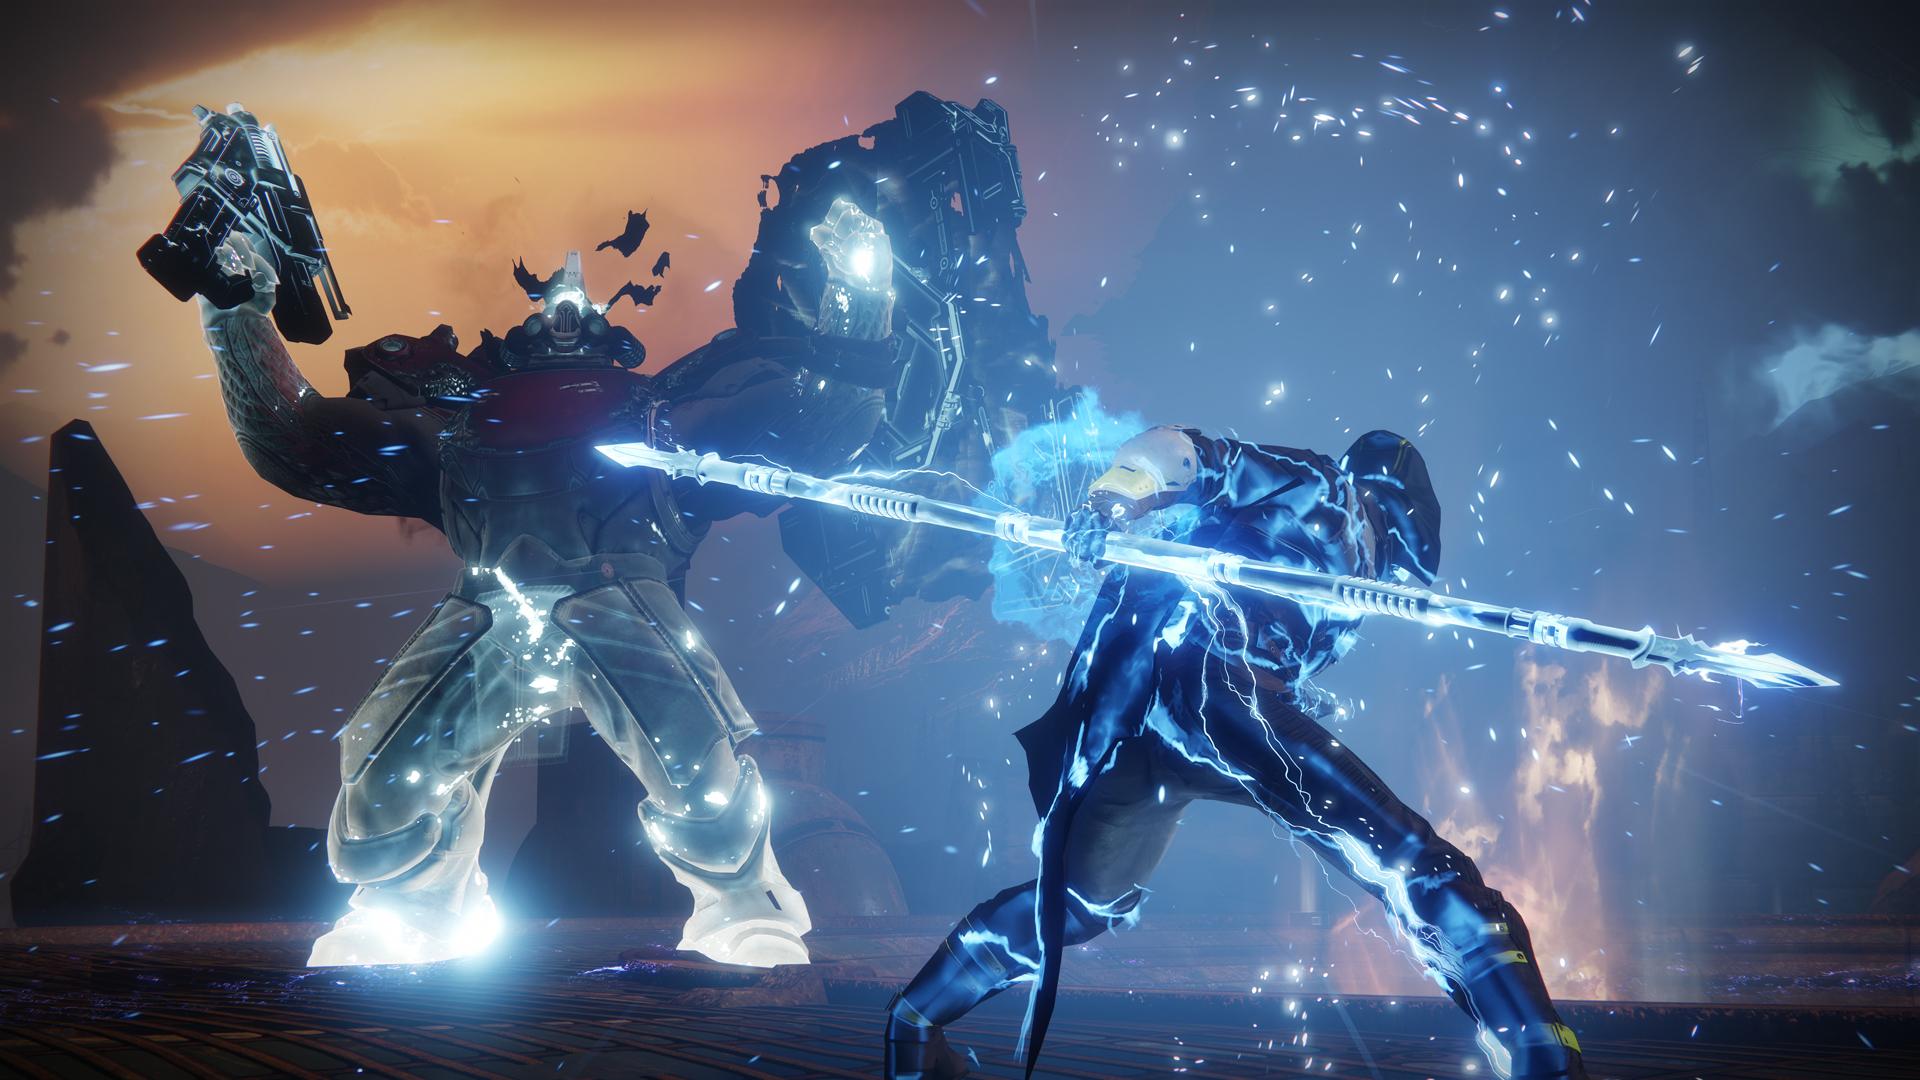 Leaked details about Destiny 2 DLC indicate that Osiris needs saving screenshot